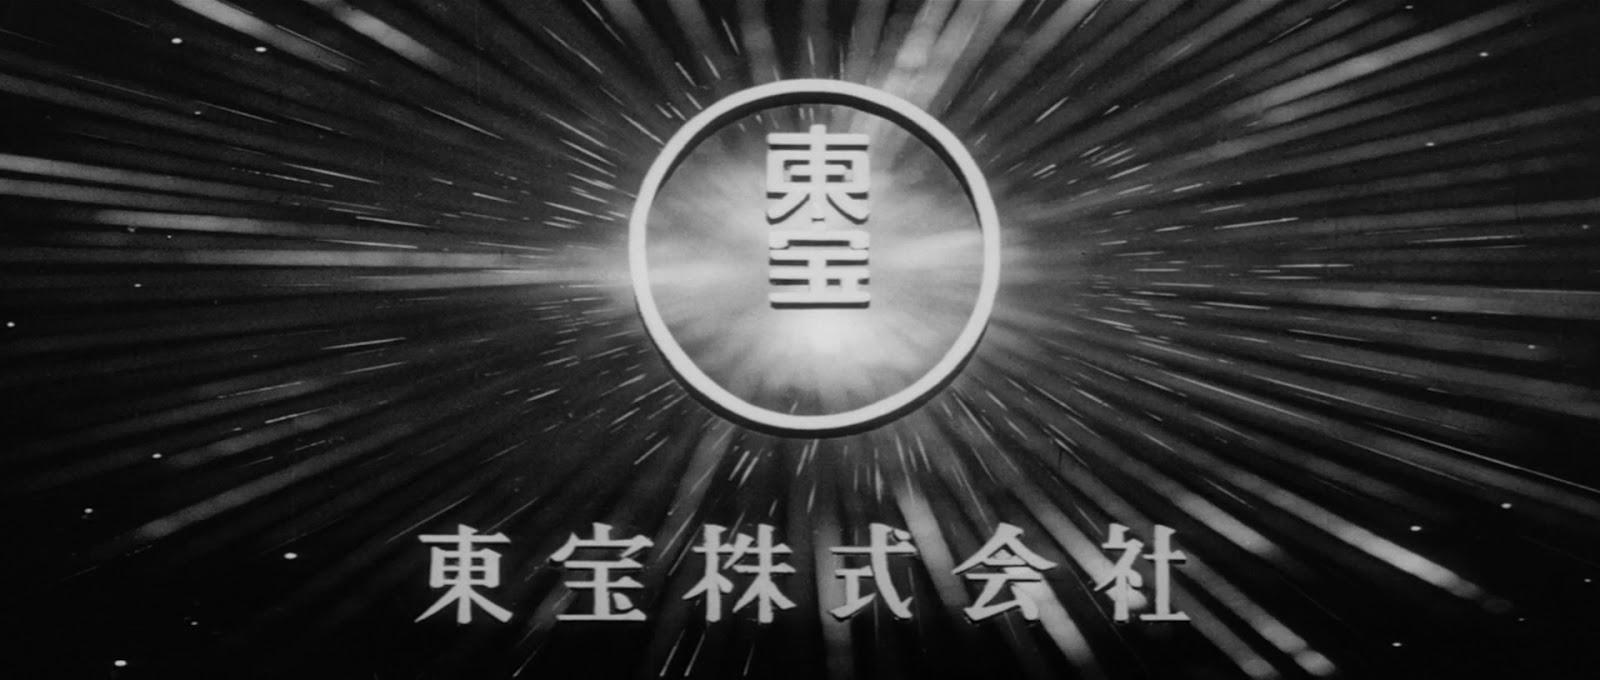 Sanjuro (Tsubaki Sanjûrô 1962)1080p|mega|ver pesada